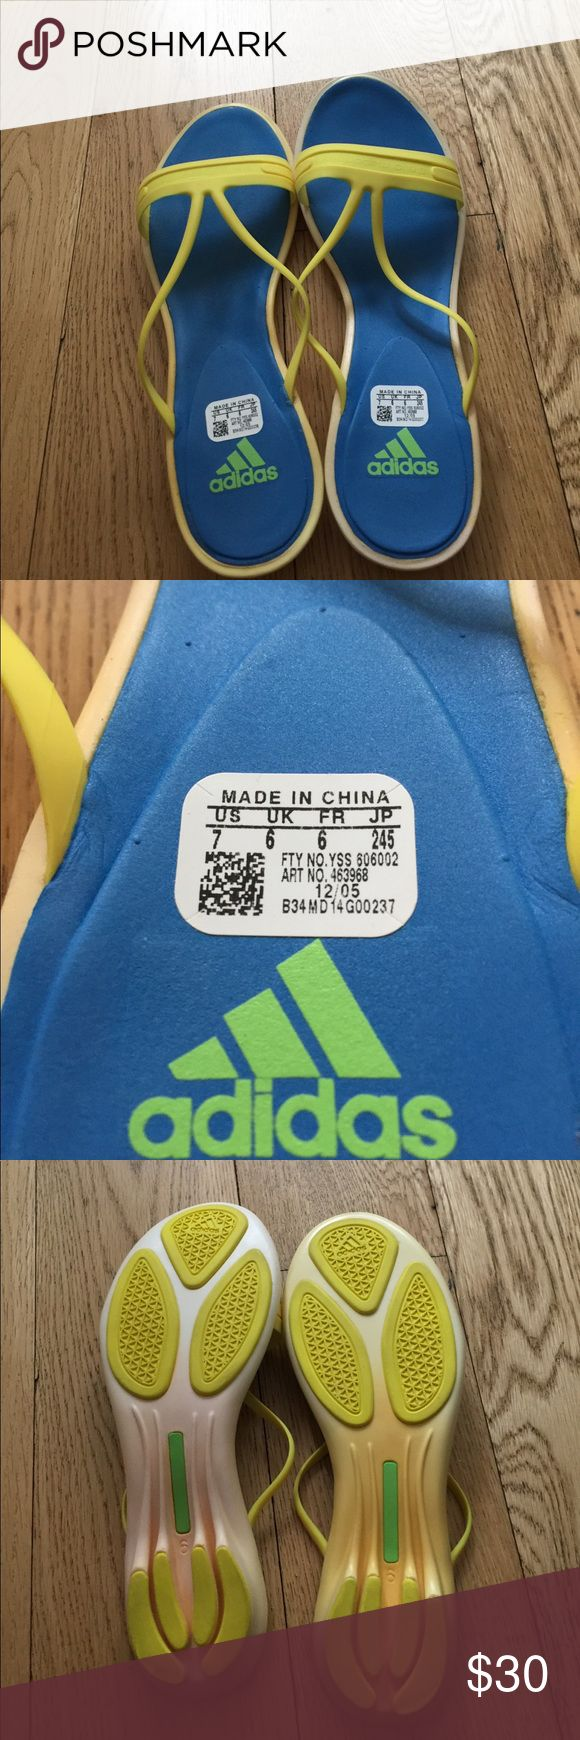 Stella McCartney Adidas Blue/Yellow Flip Flops Size 7. Like new! Adidas by Stella McCartney Shoes Sandals